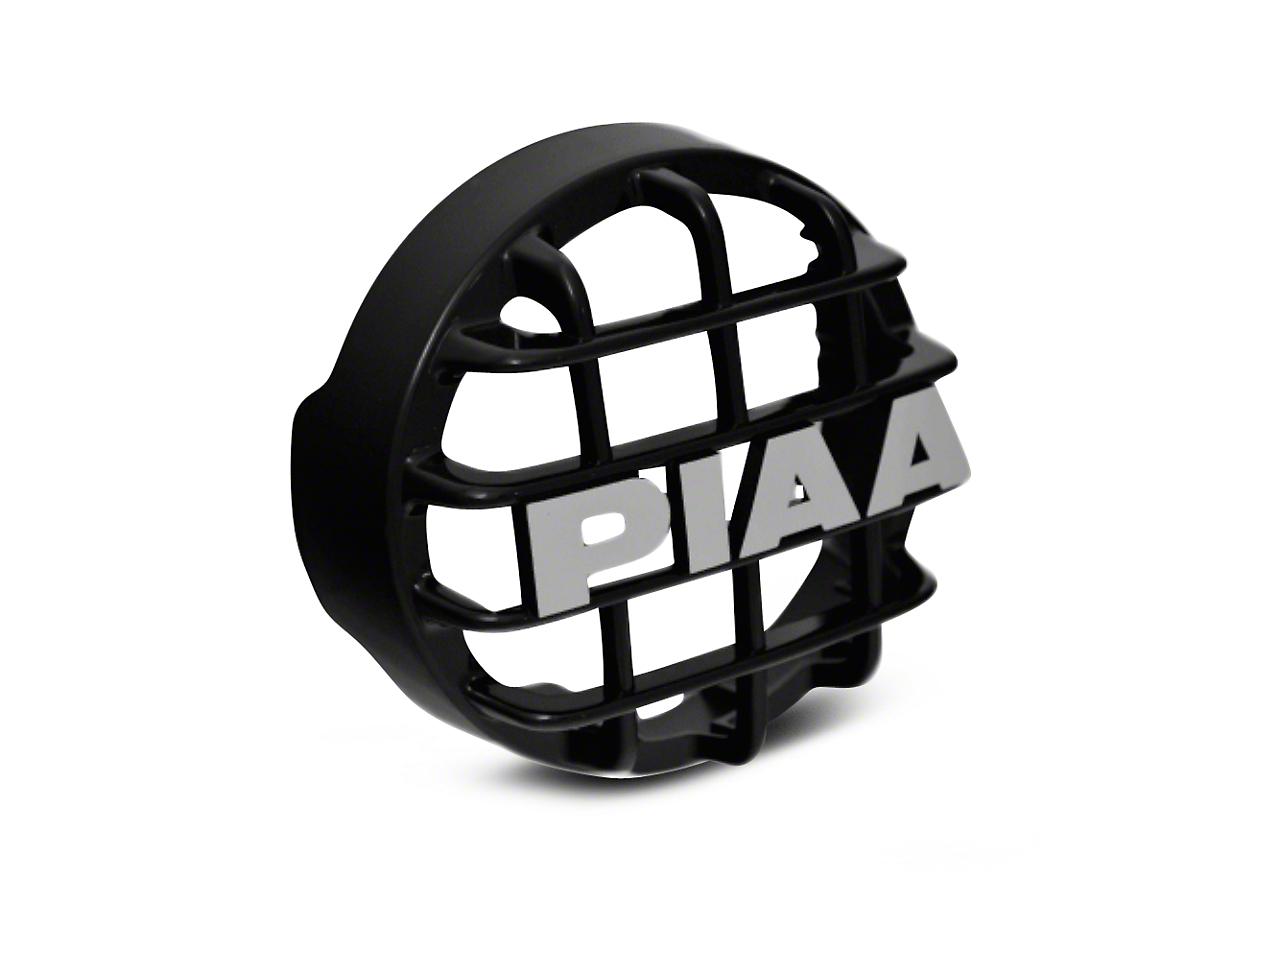 PIAA 510 Series 4 in. Black Mesh Grille w/ PIAA Logo (07-18 Sierra 1500)